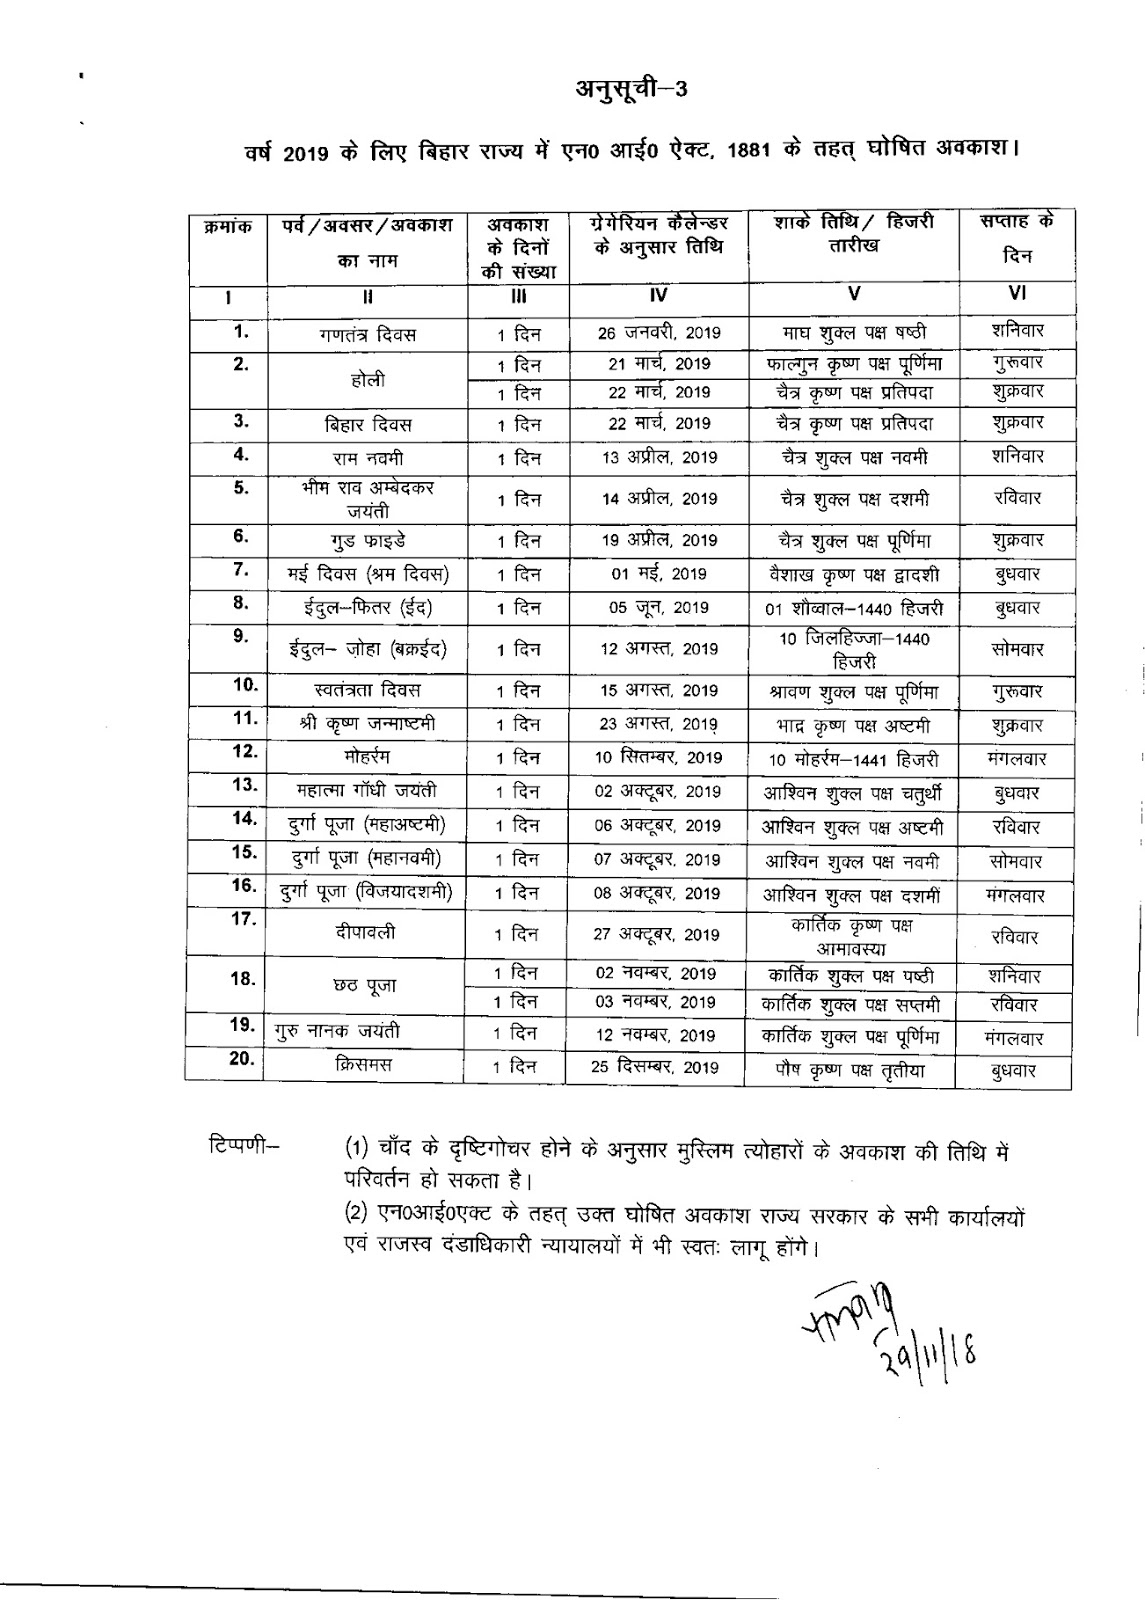 Bihar Government Calendar 2019 #educratsweb with Calendar 2020 Bihar Sarkar